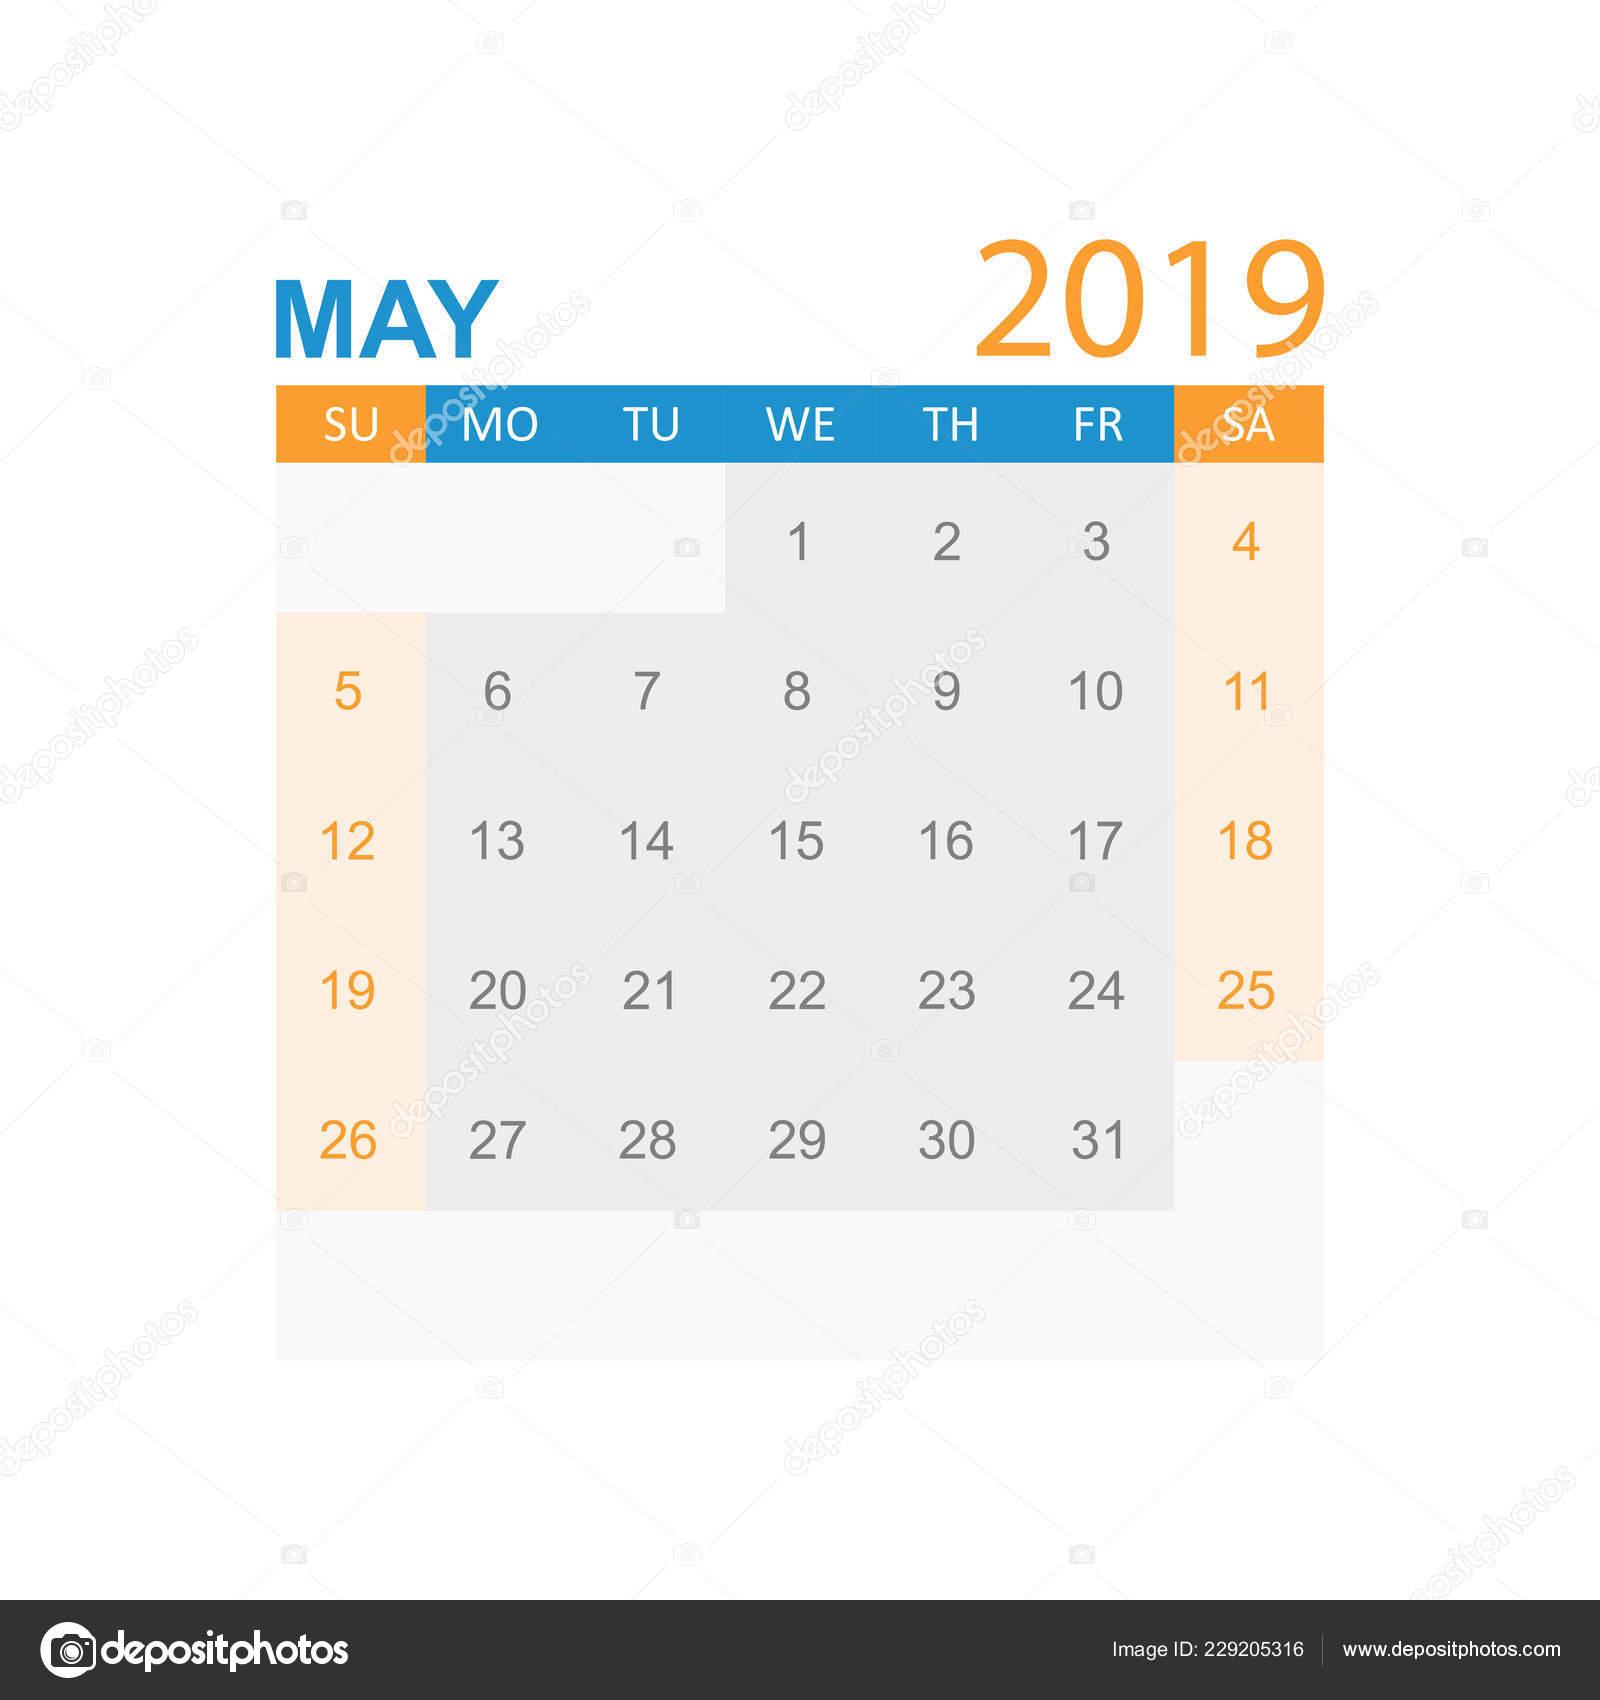 Calendrier Mai2019.Calendrier Mai 2019 Annee Dans Style Simple Modele